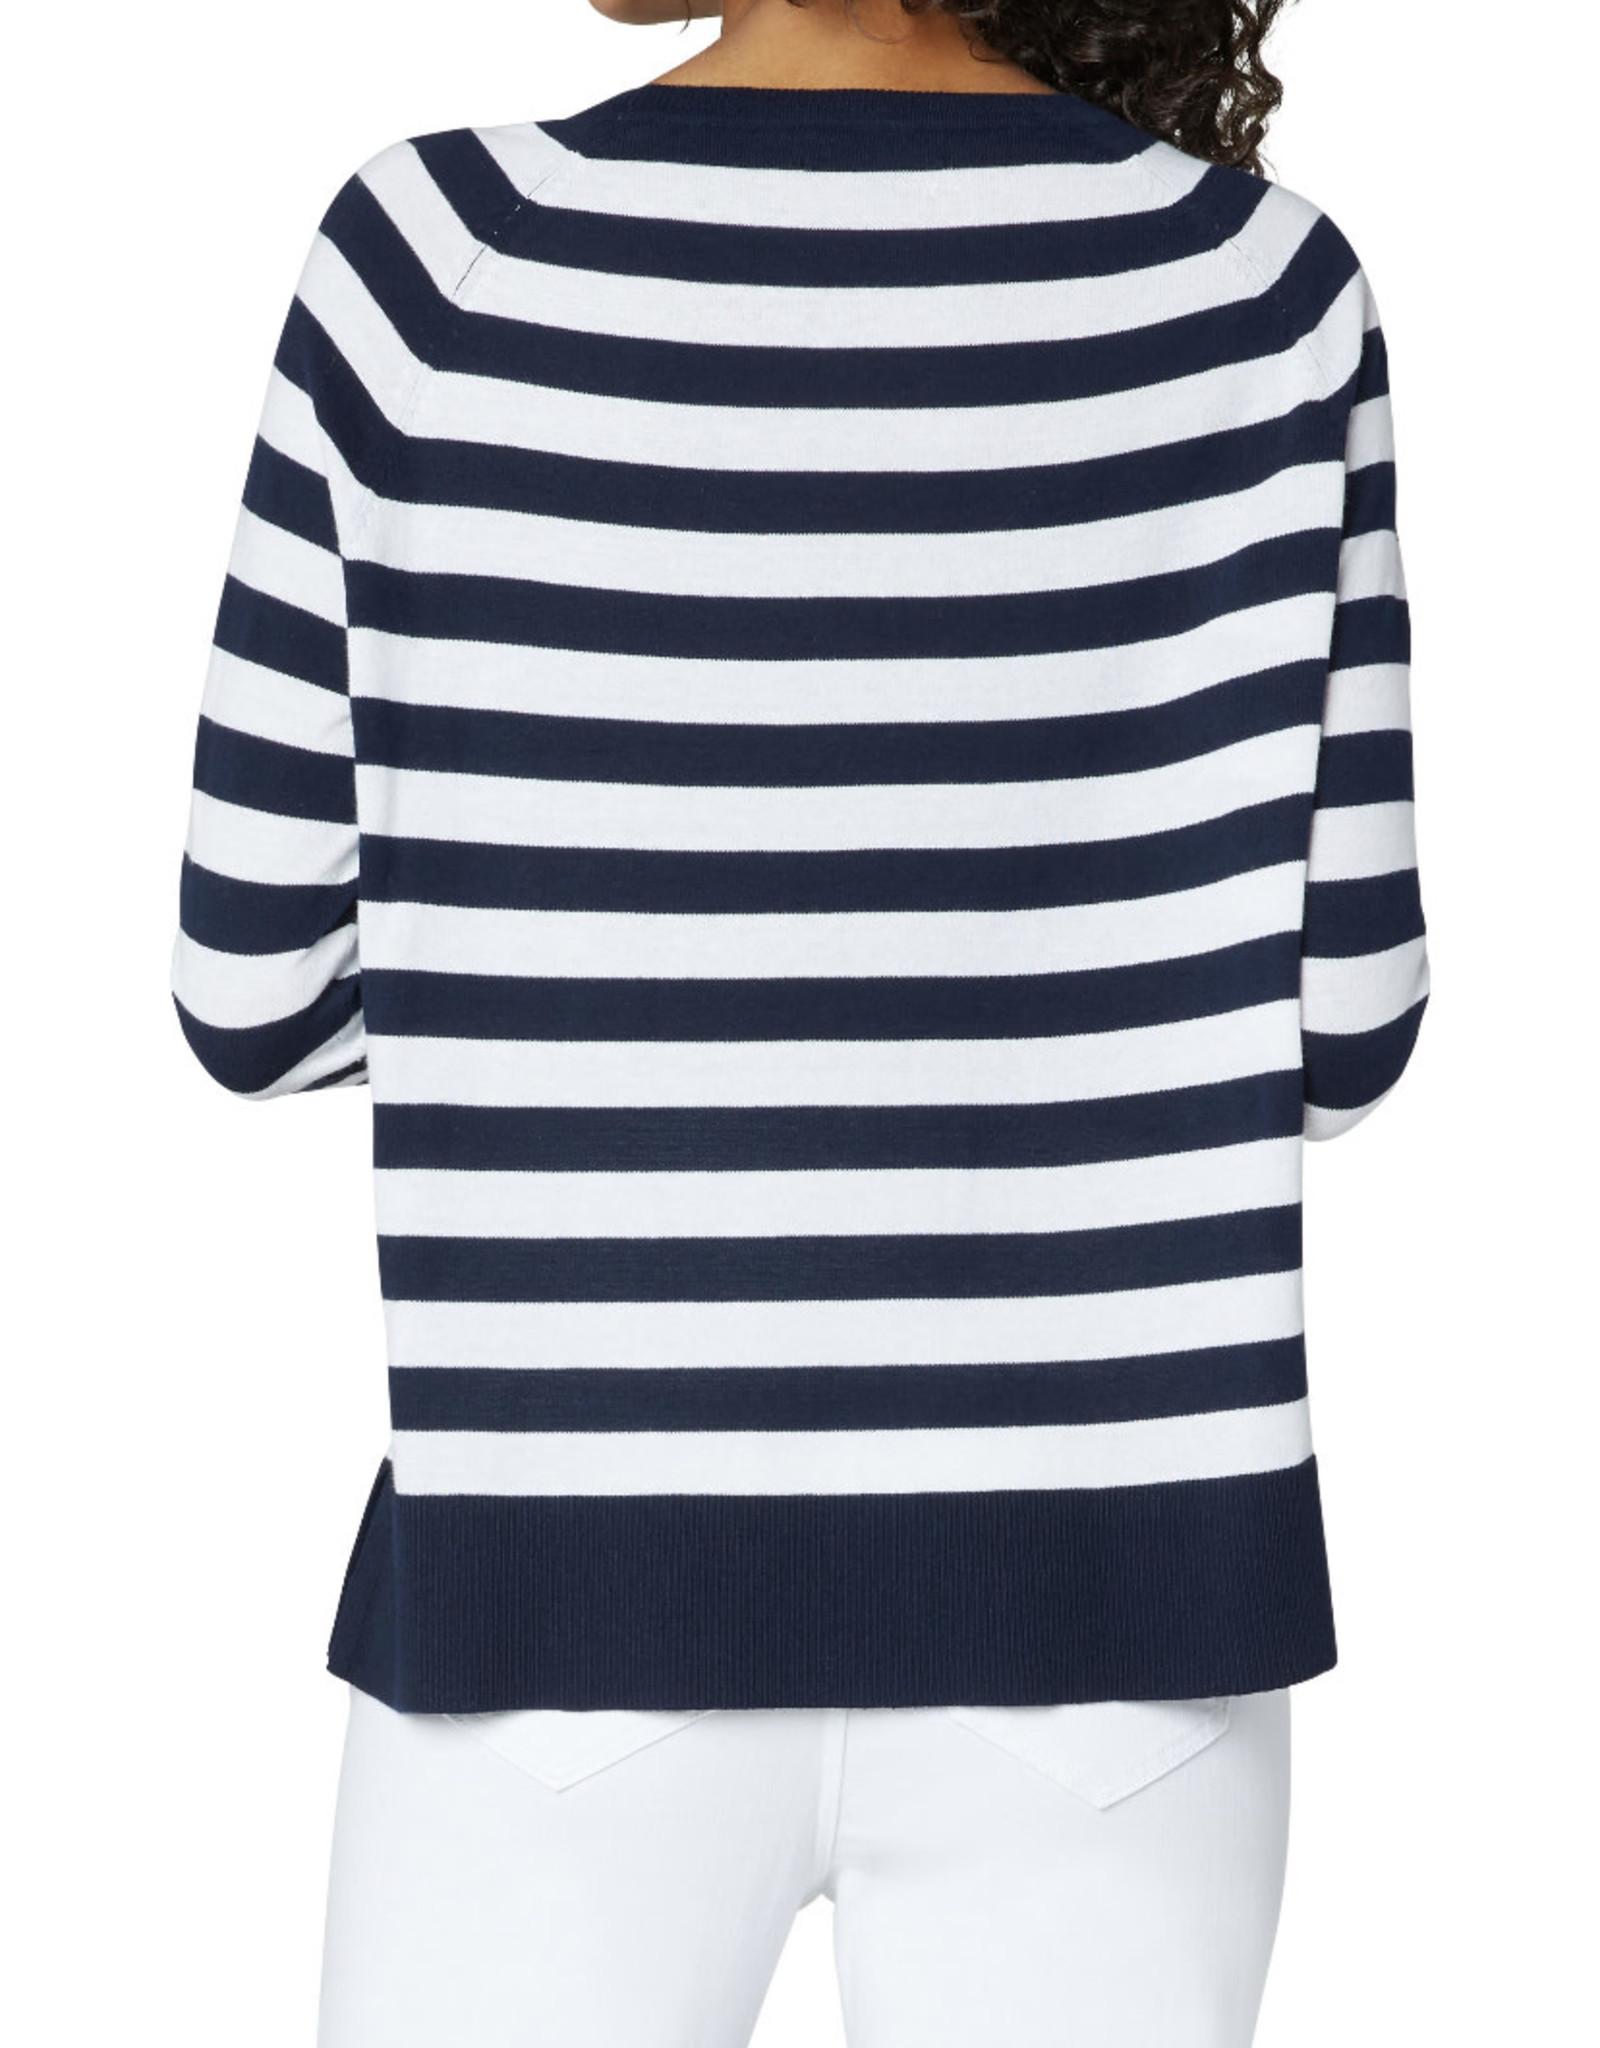 Liverpool Striped raglan sweater